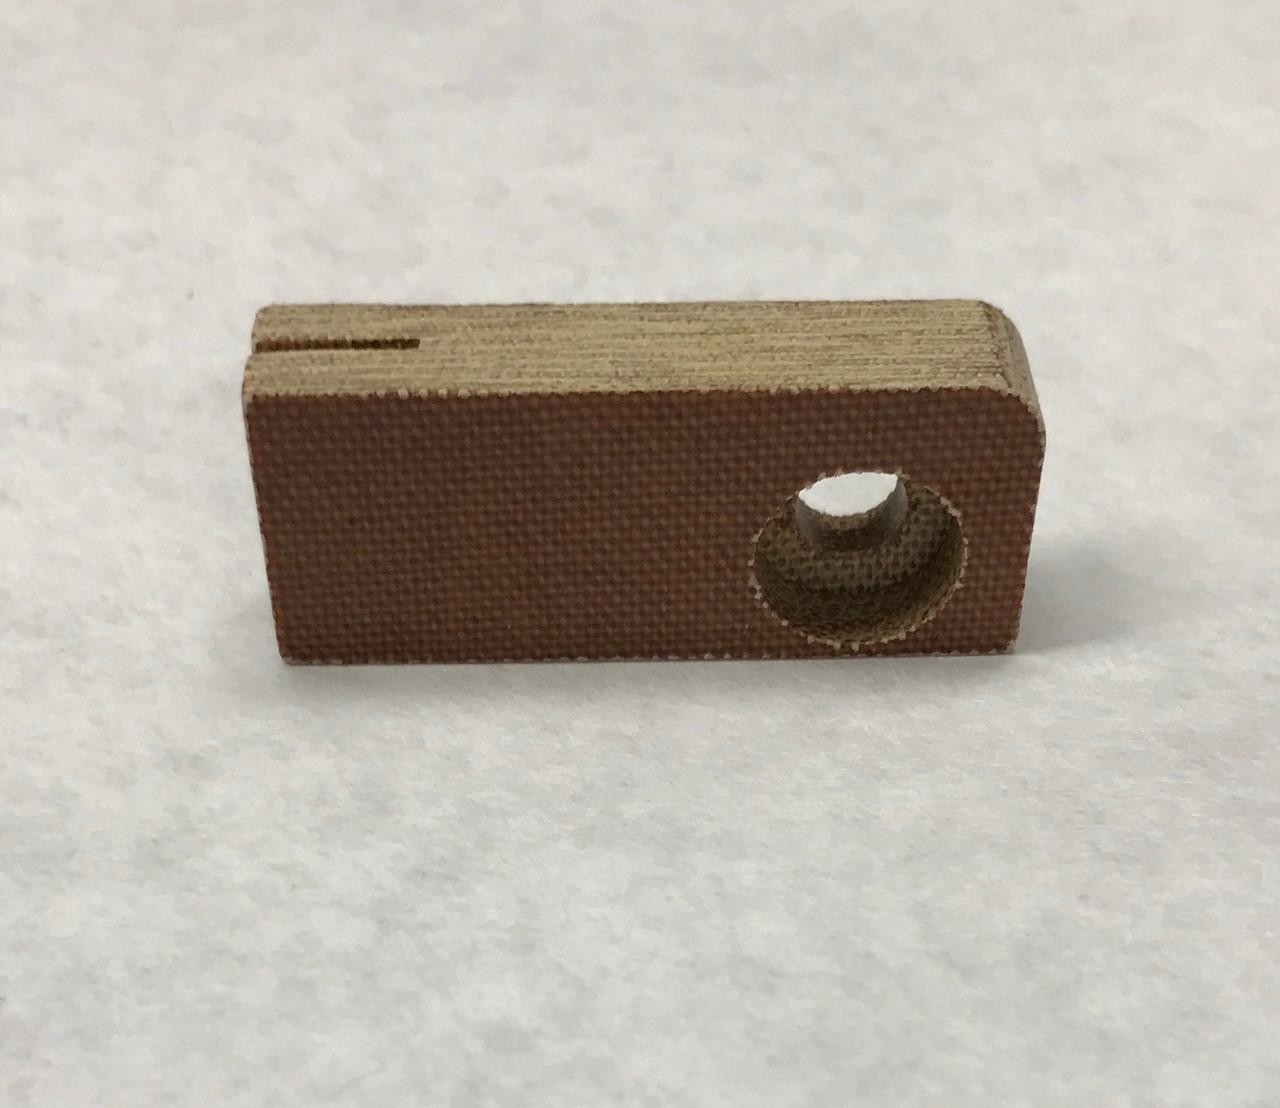 TorRey ST-200,ST-295,ST-305 - Fiber Filler Block